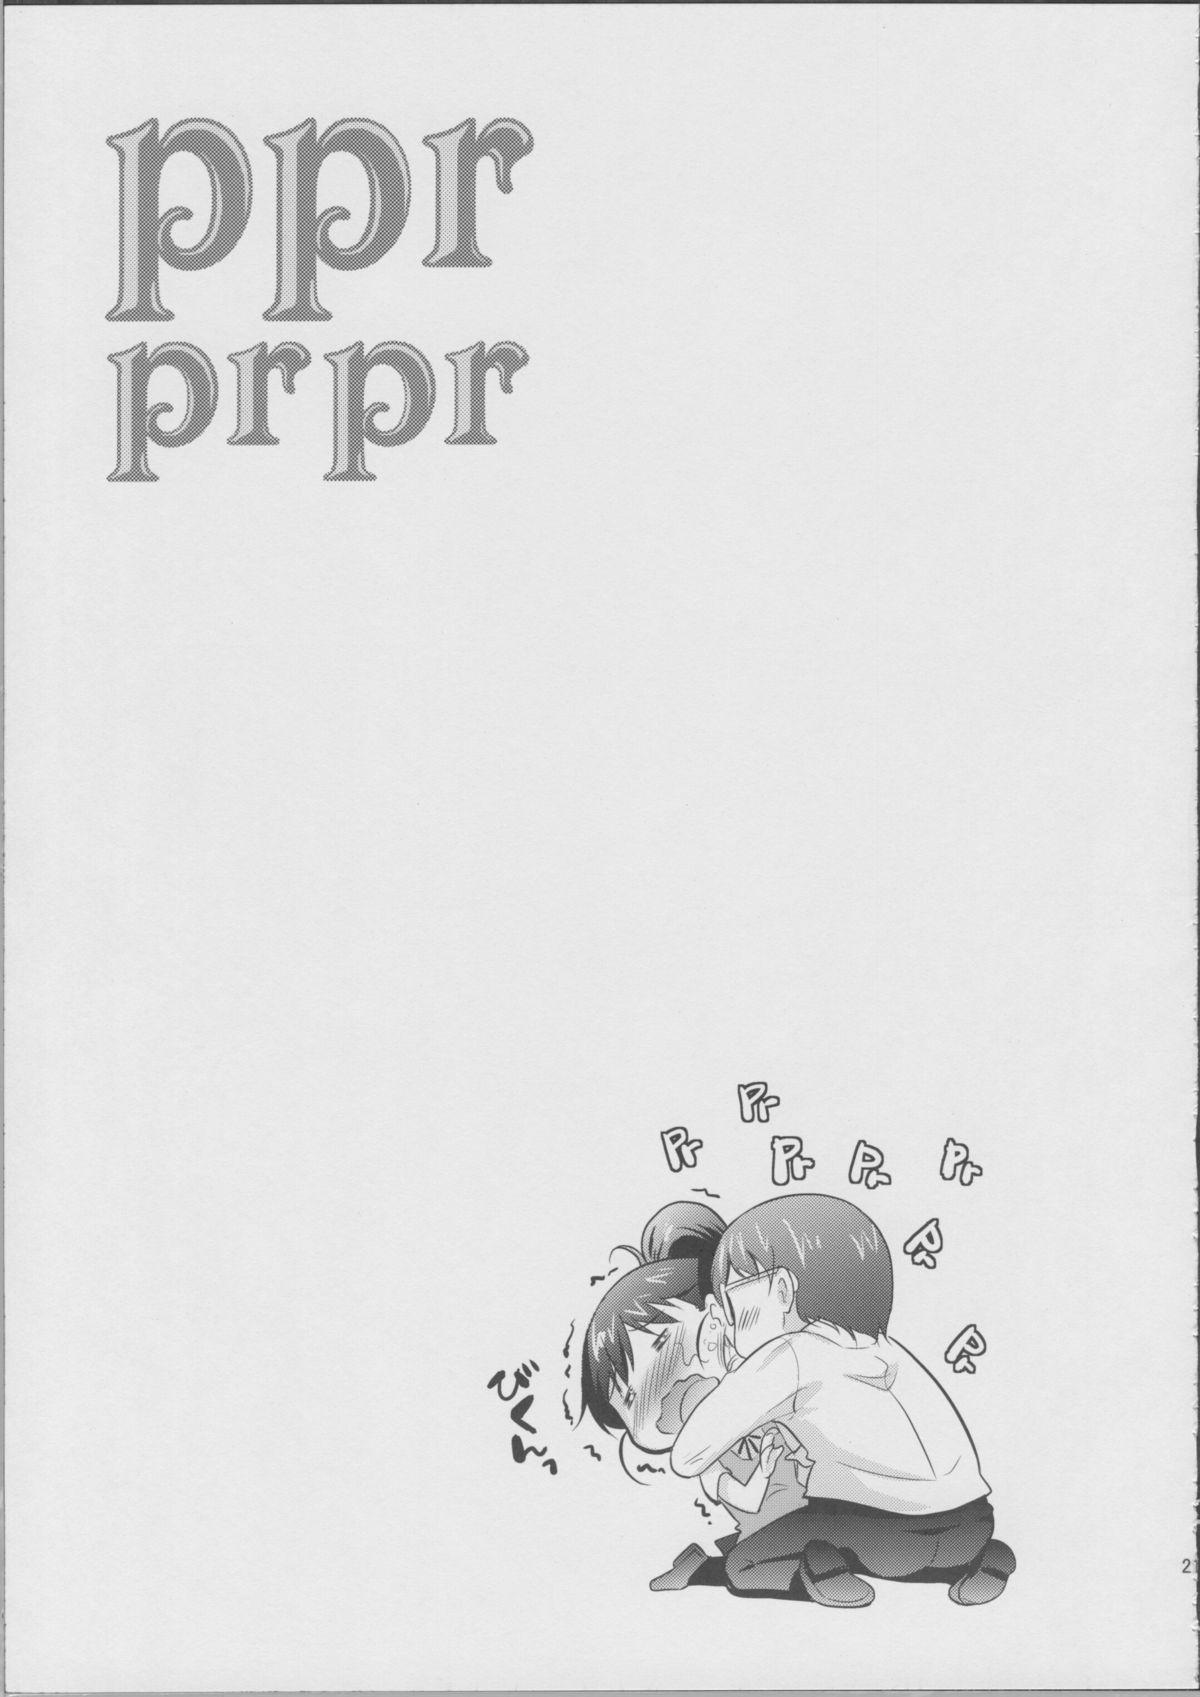 ppr prpr 21